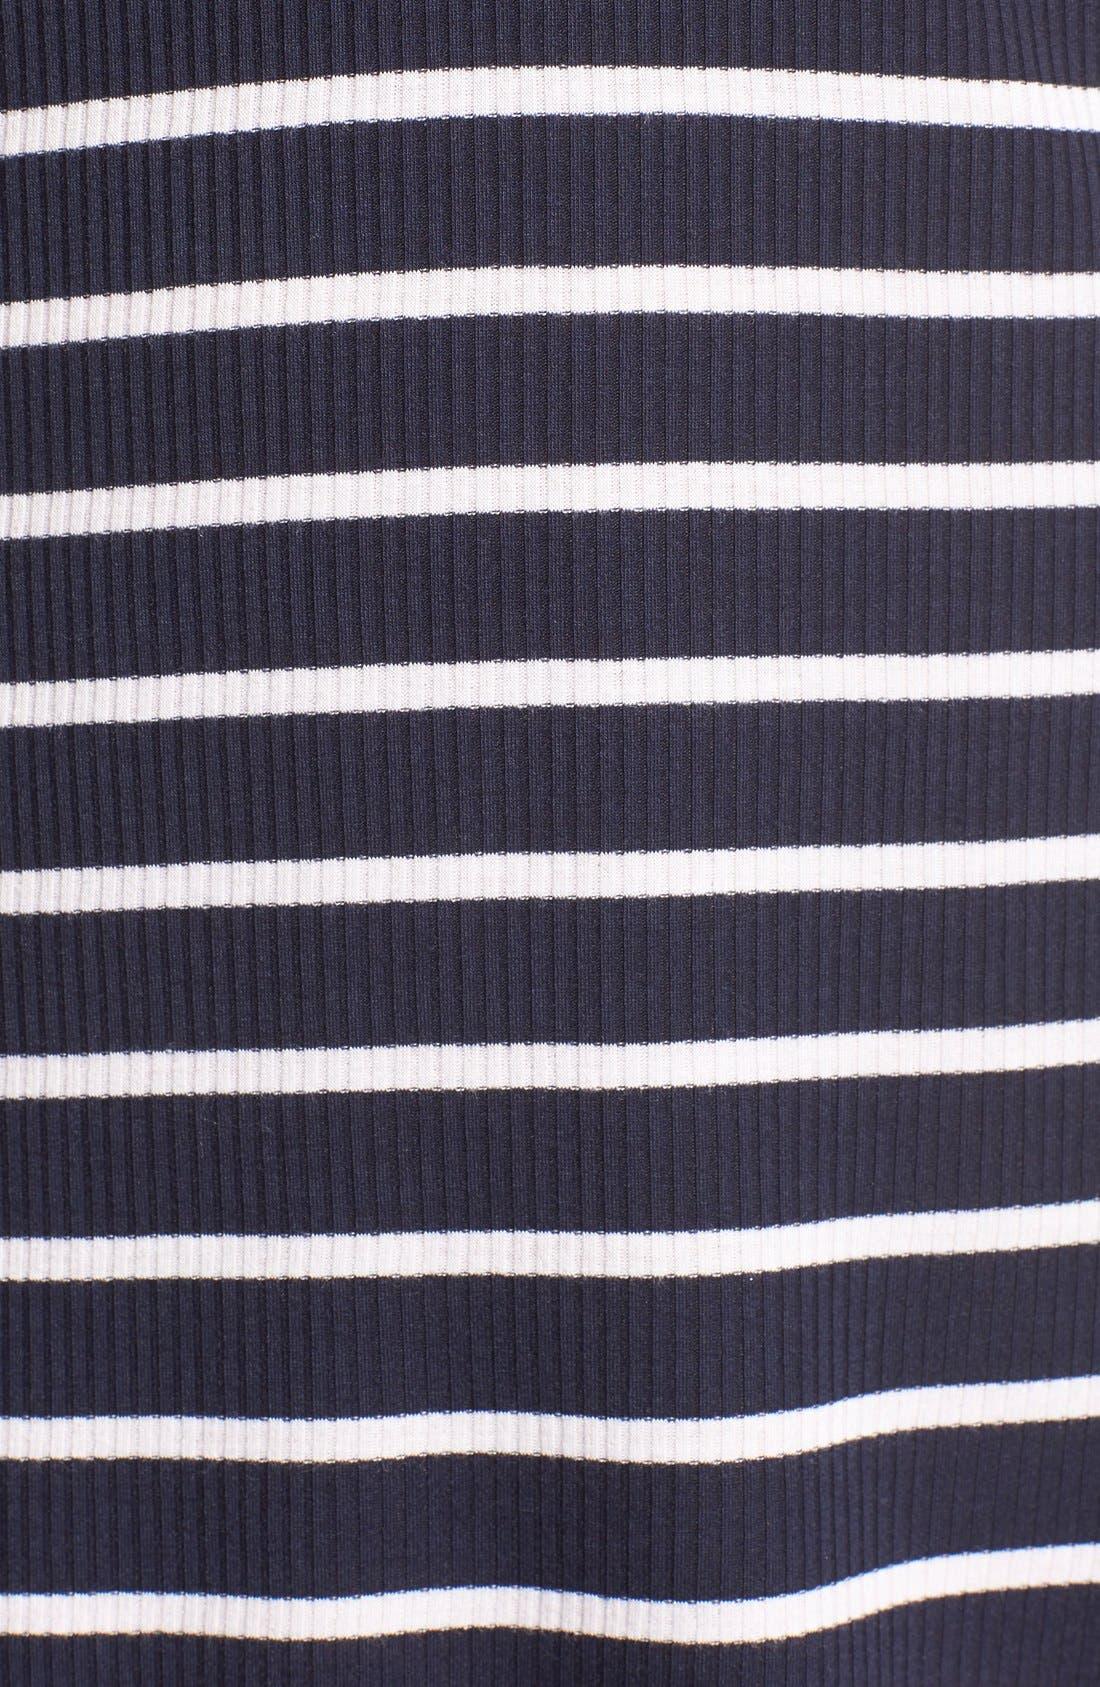 SOCIALITE, Stripe Lace-Up Minidress, Alternate thumbnail 5, color, 466